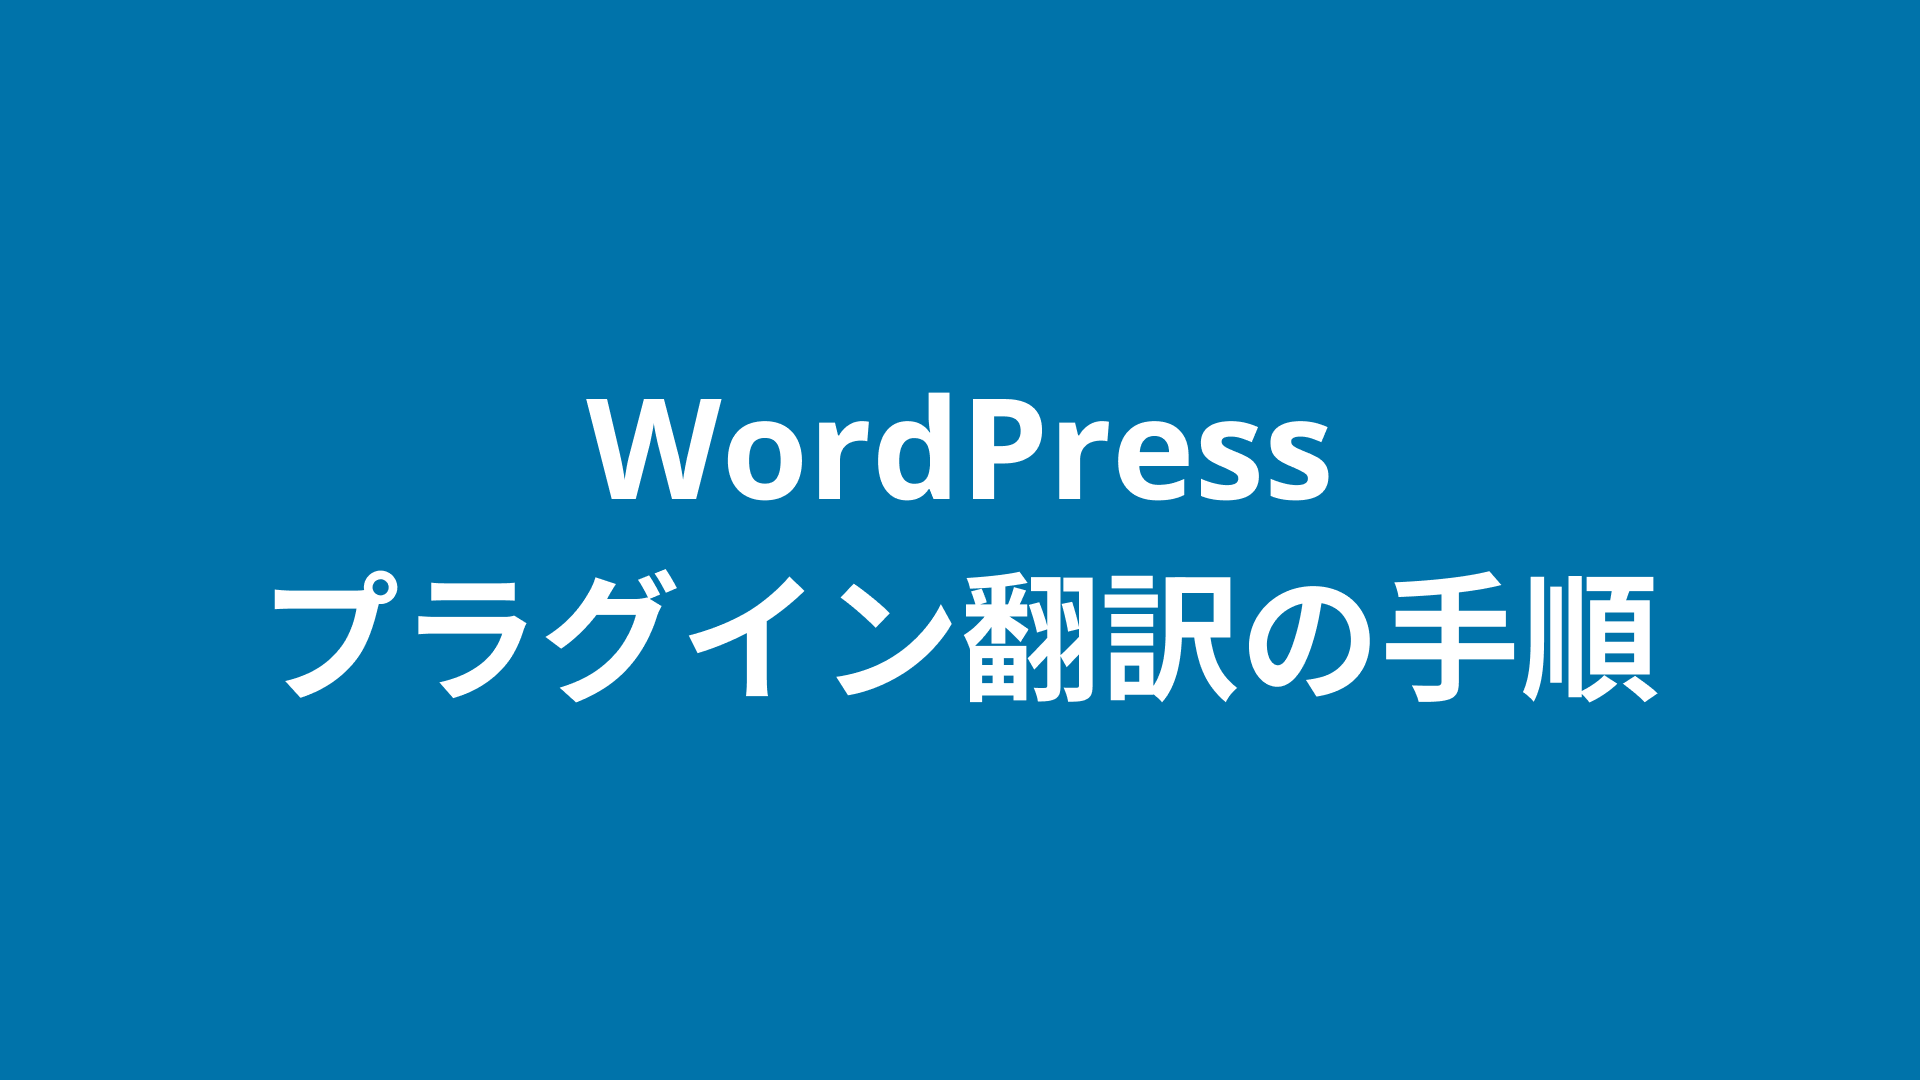 Naoko Takano: WordPress プラグイン翻訳の手順 (日本語)